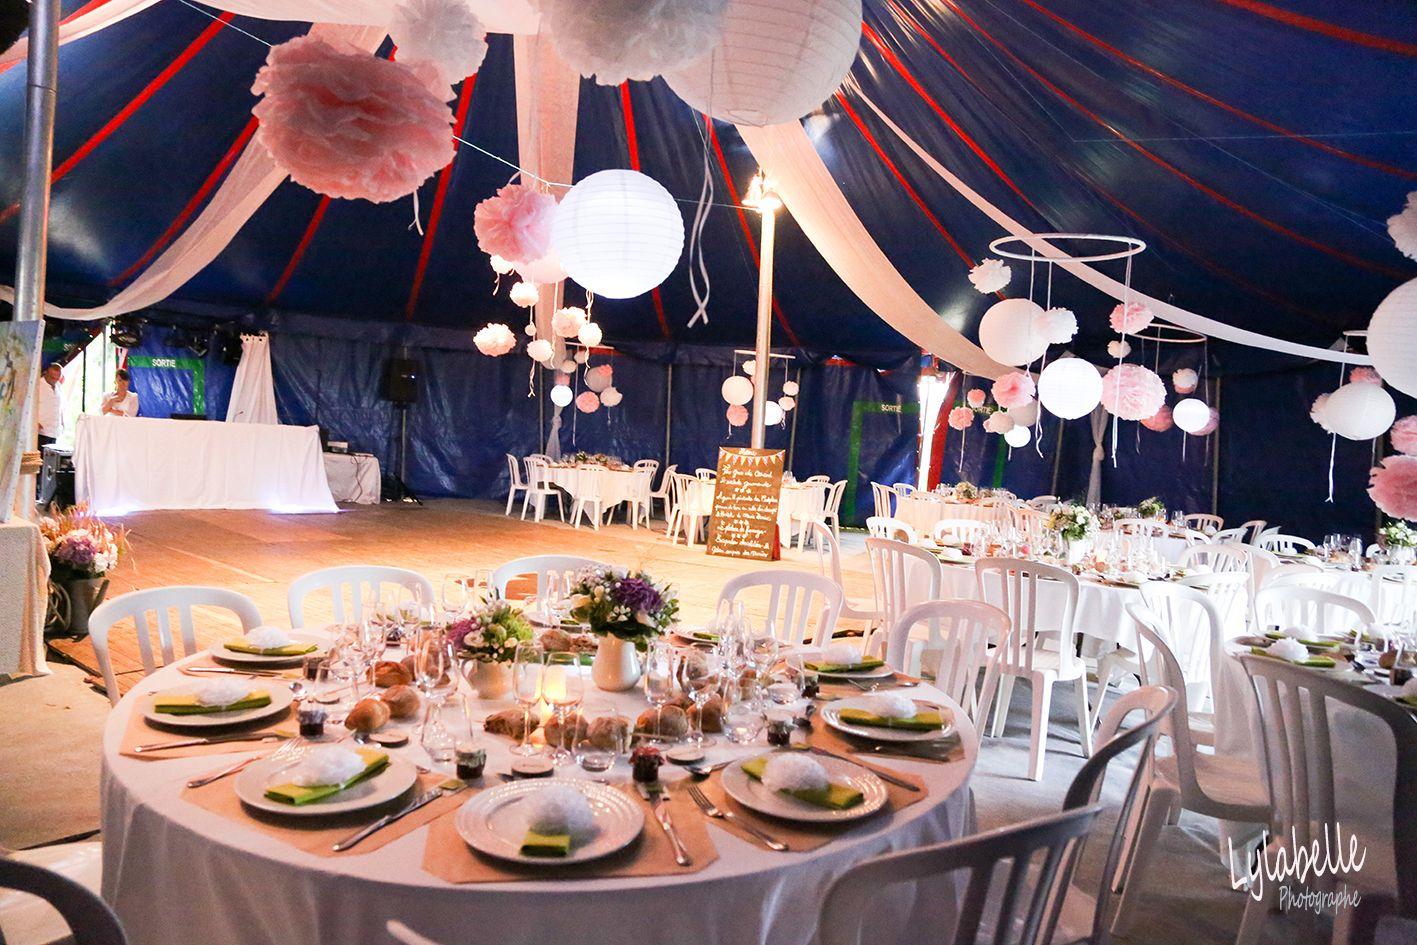 Mariage joli mariage rustique champ tre derni re partie mariages rustiques rustique et - Foto deco ...